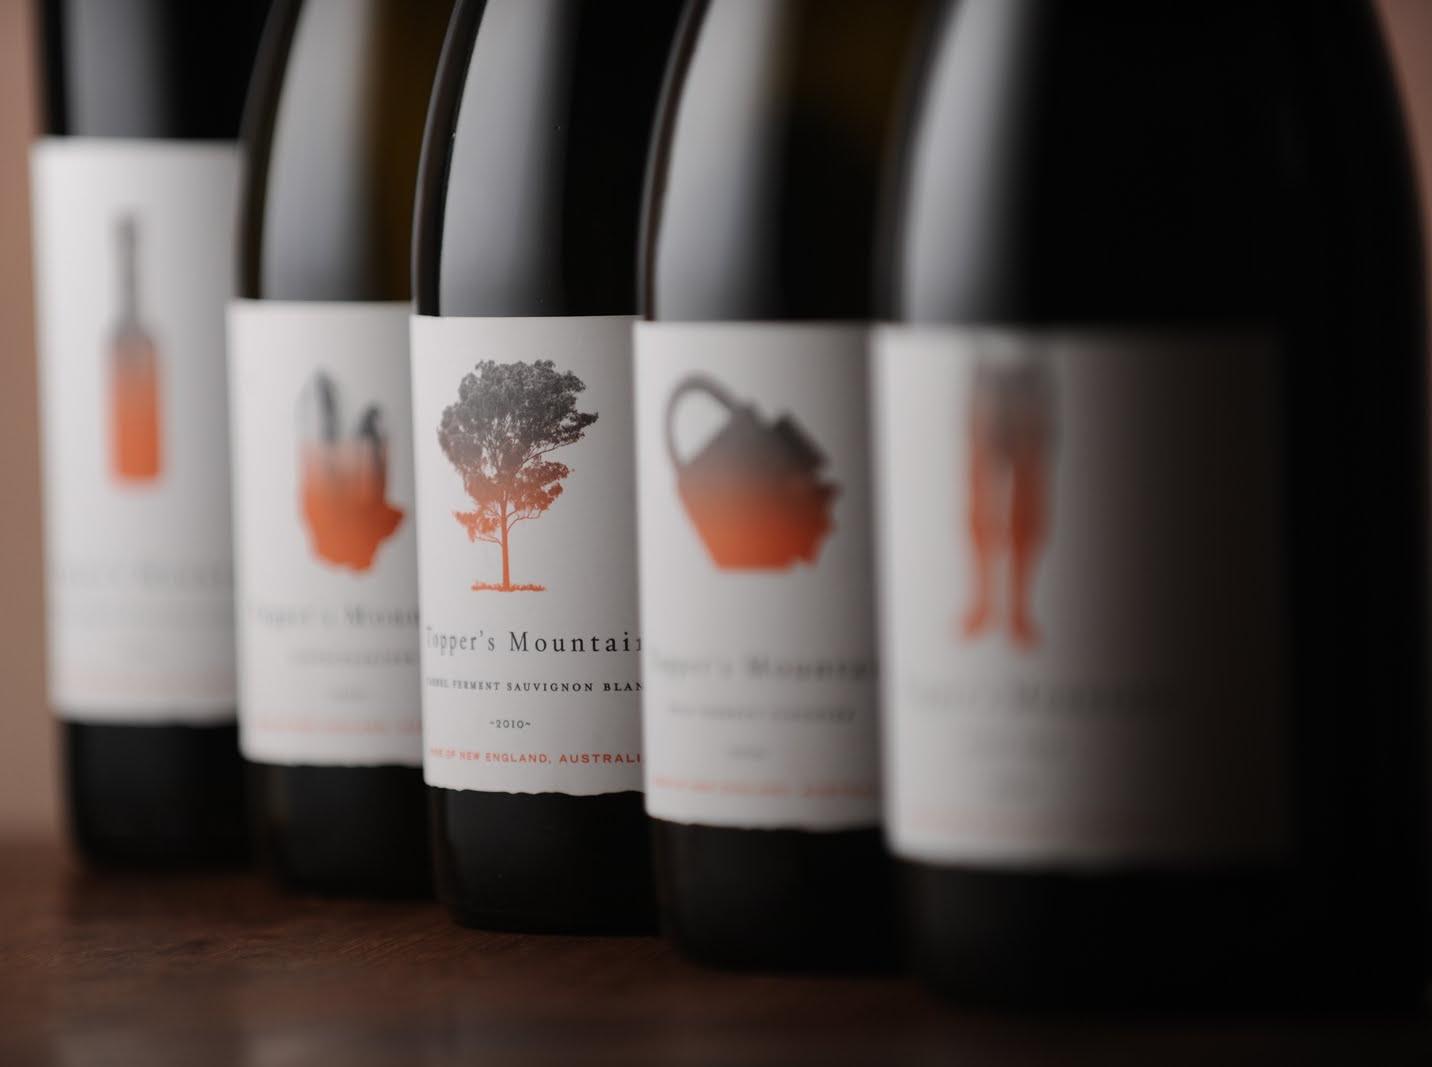 Topper's Mountain wine